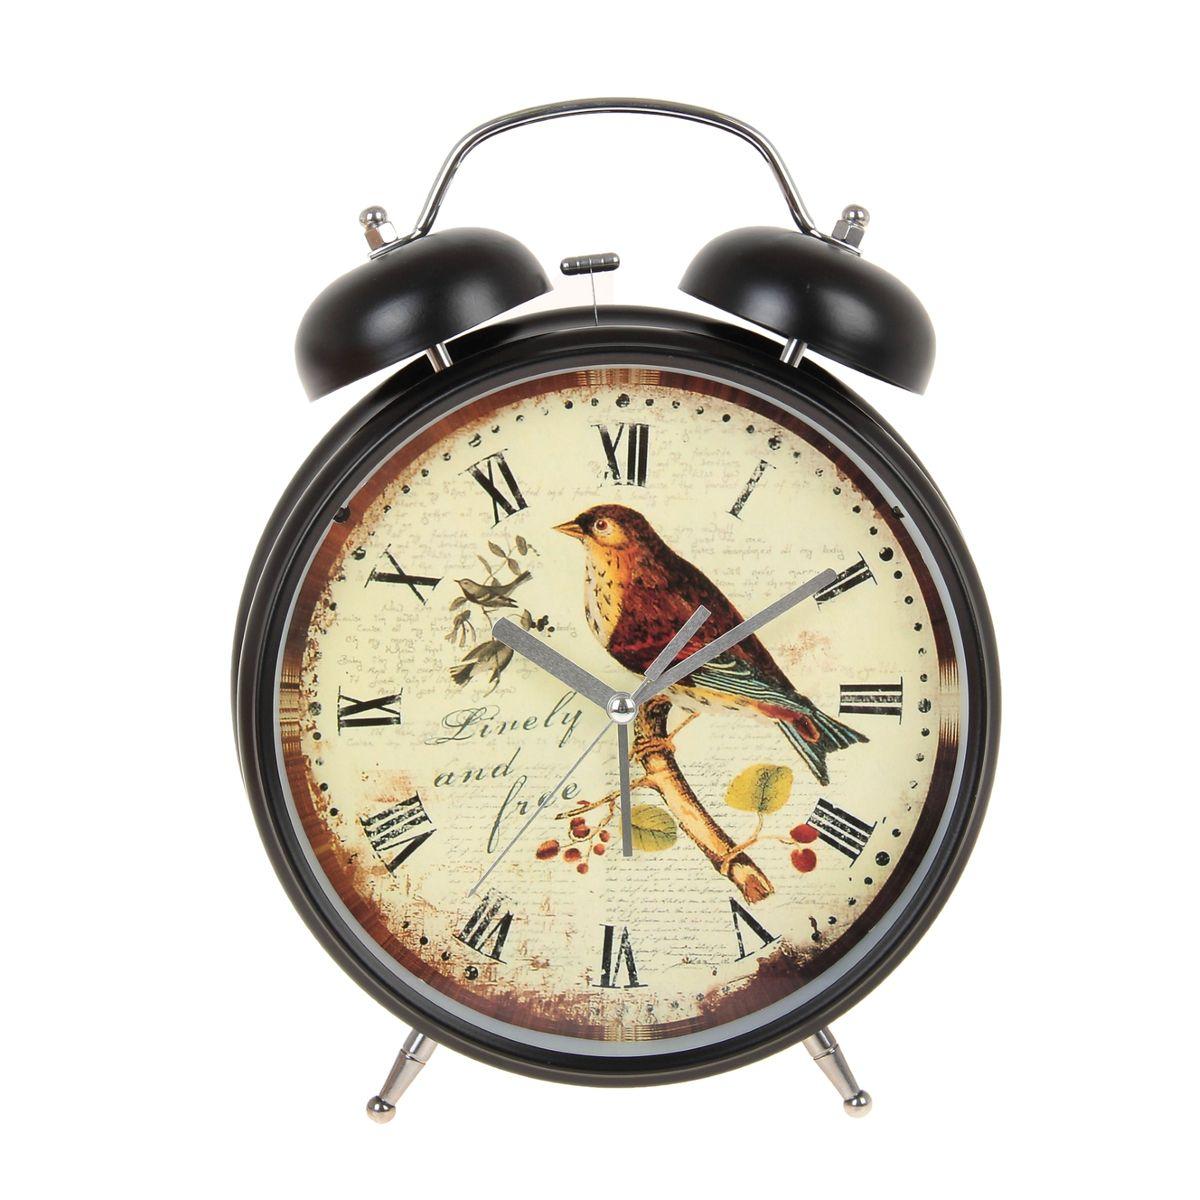 "Часы-будильник Sima-land ""Linely And Free"", цвет: черный, светло-желтый, диаметр 20 см"